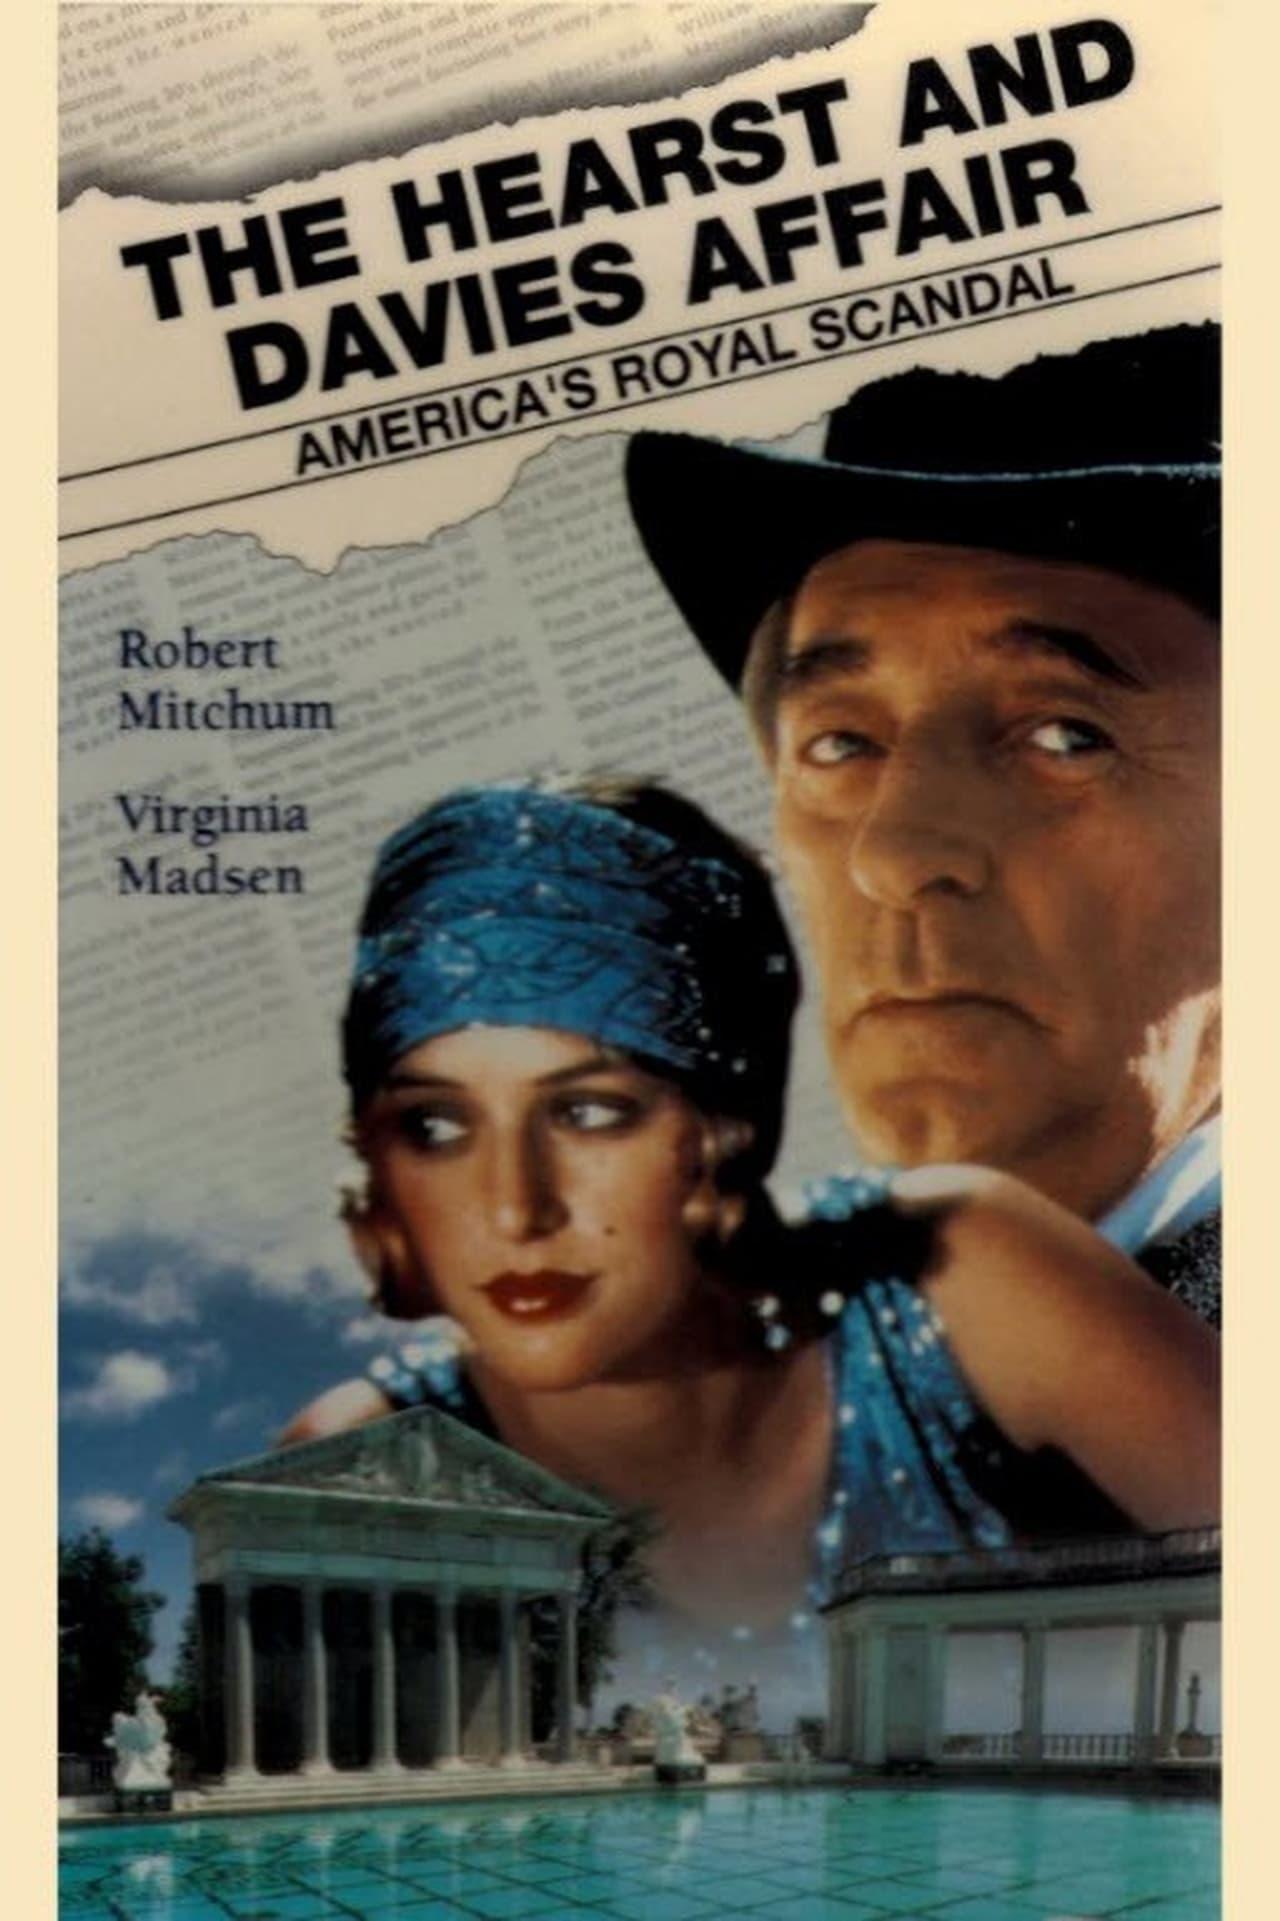 The Hearst and Davies Affair